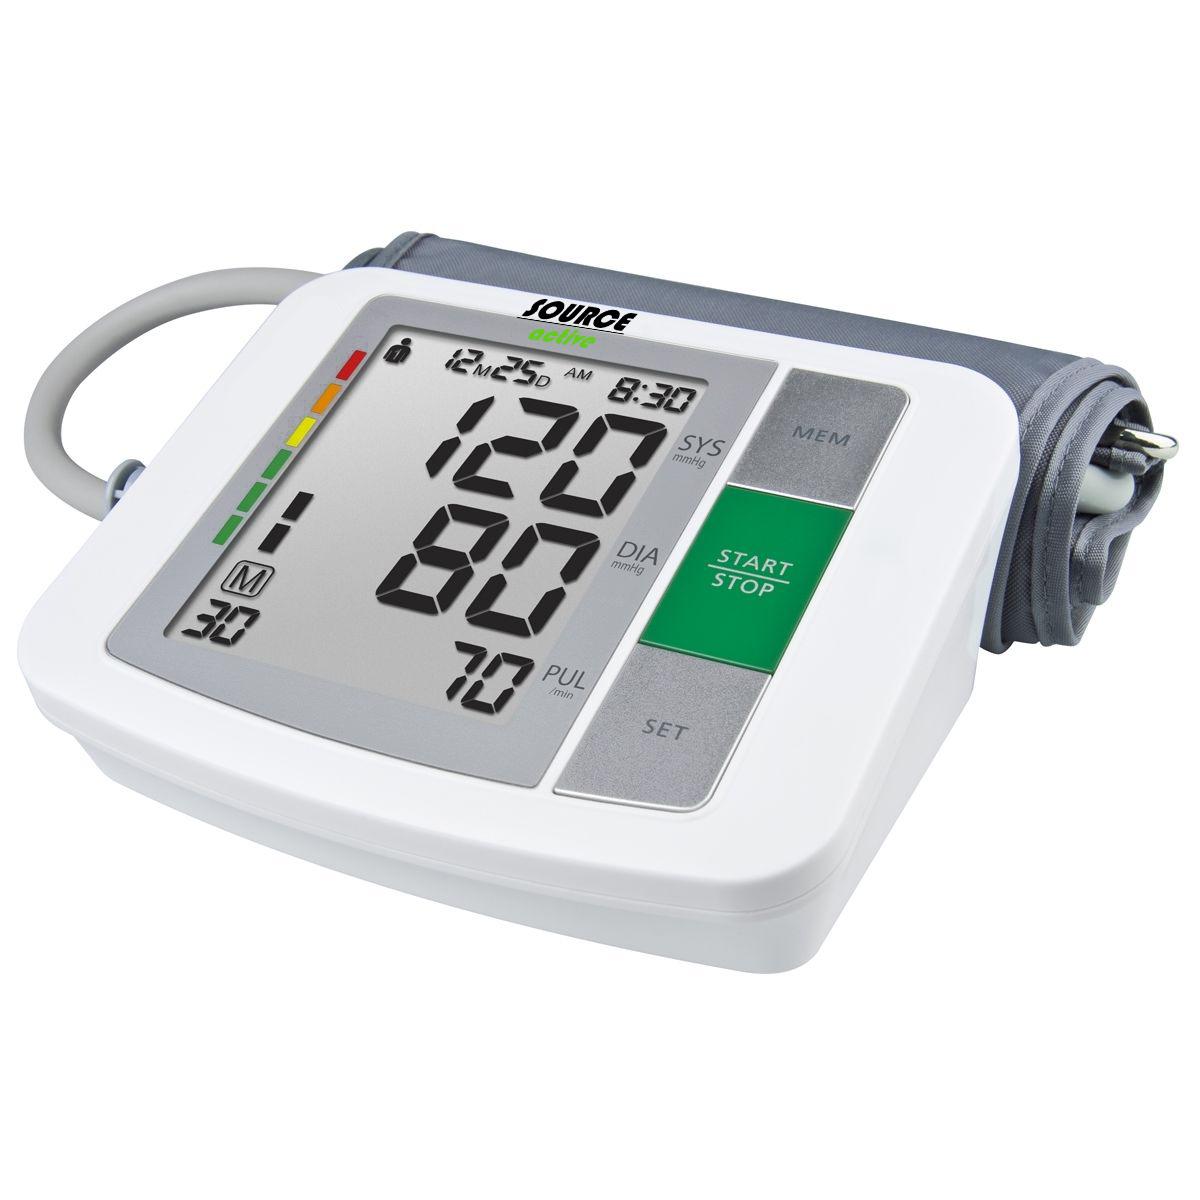 Berg J100 Pro Slow Juicer Review : Talking Blood Pressure Monitor